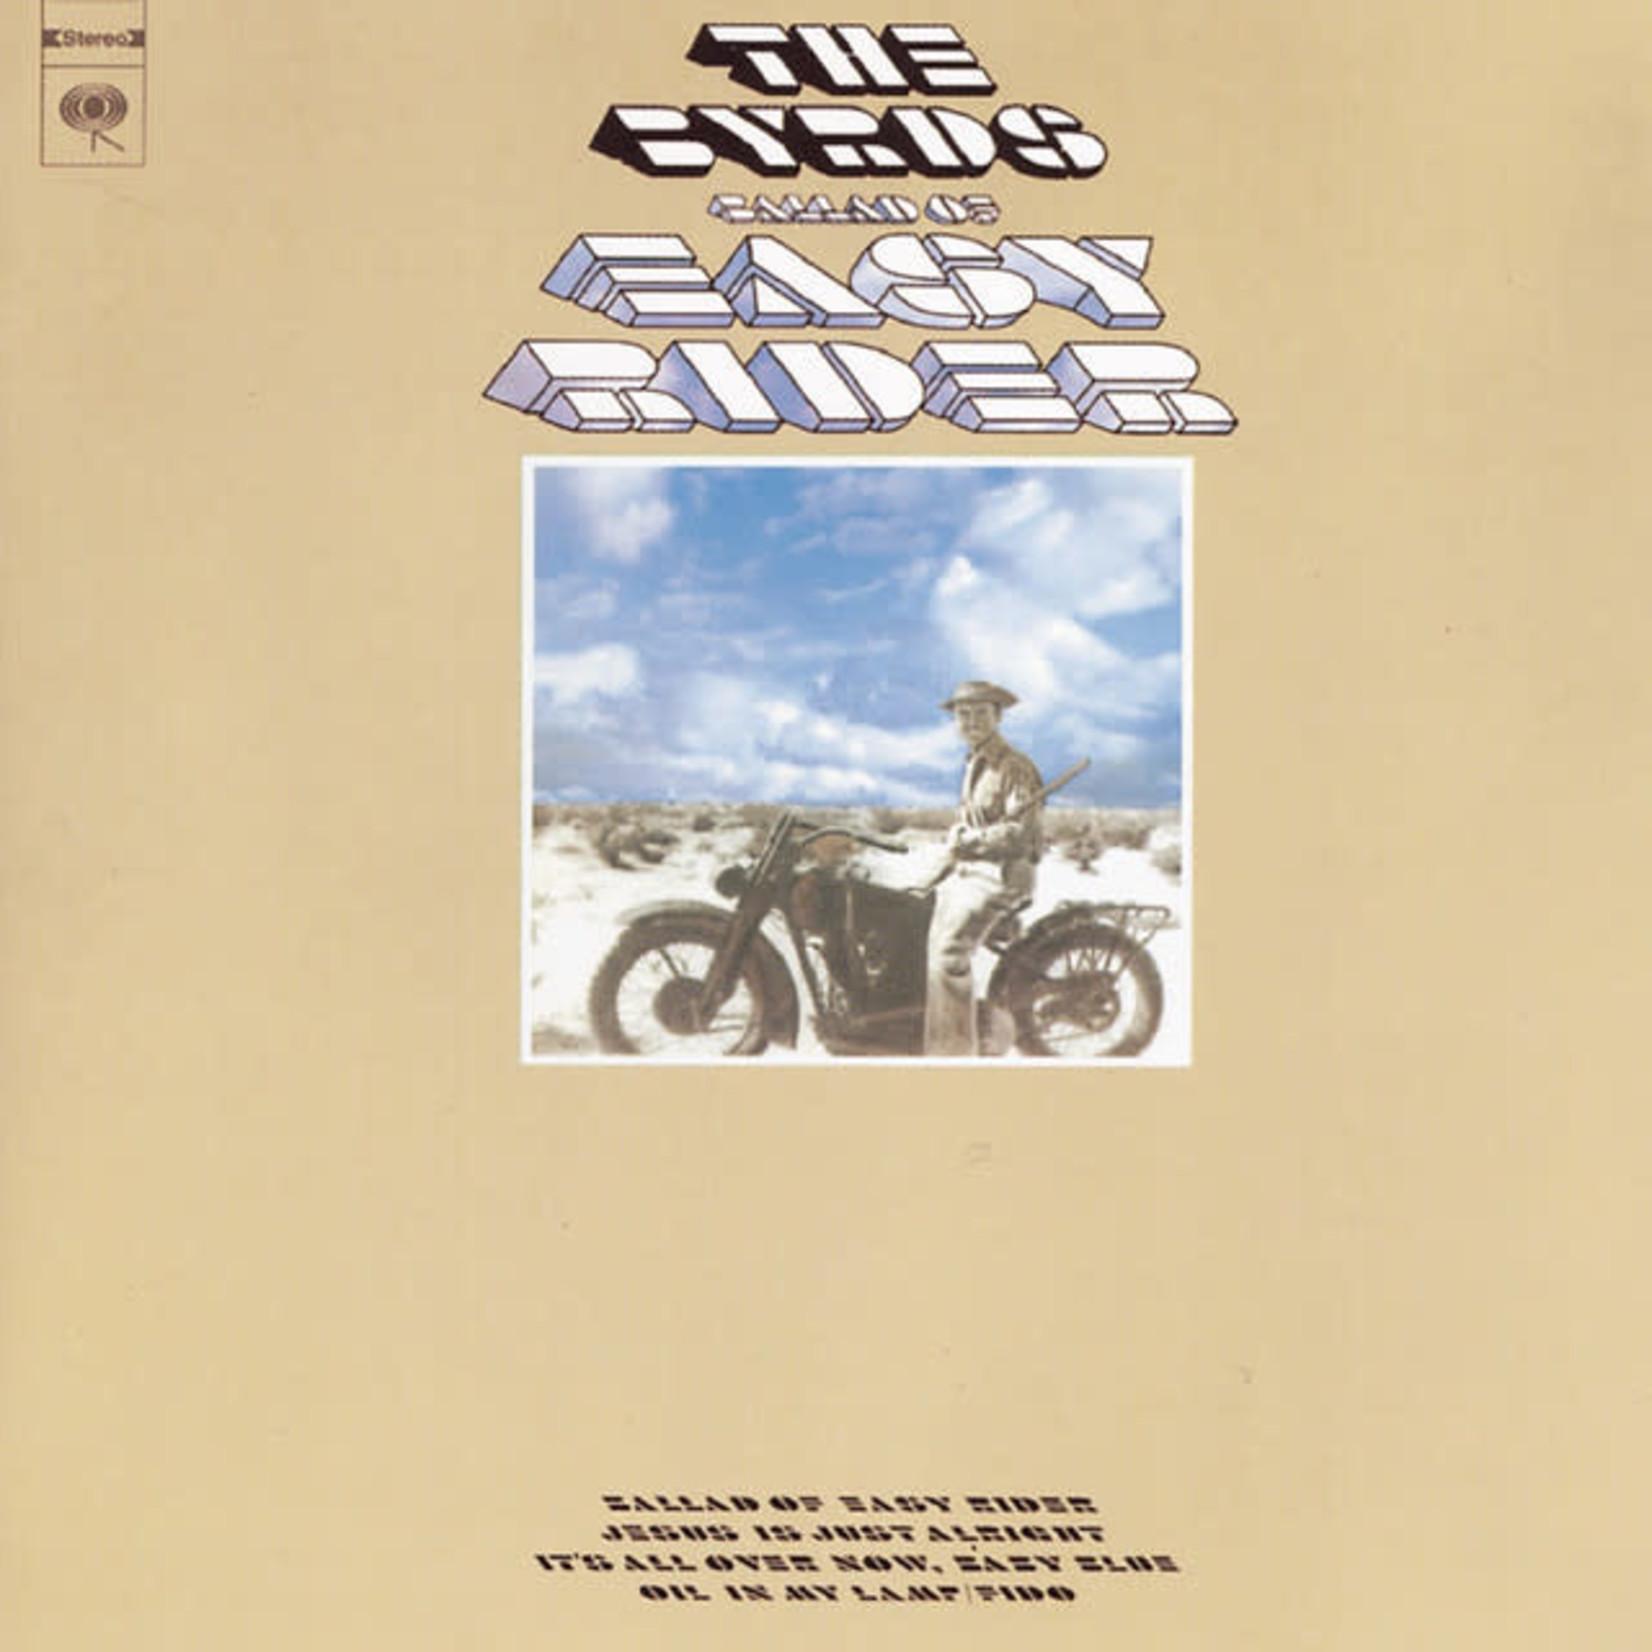 Vinyl The Byrds - Ballad Of Easy Rider